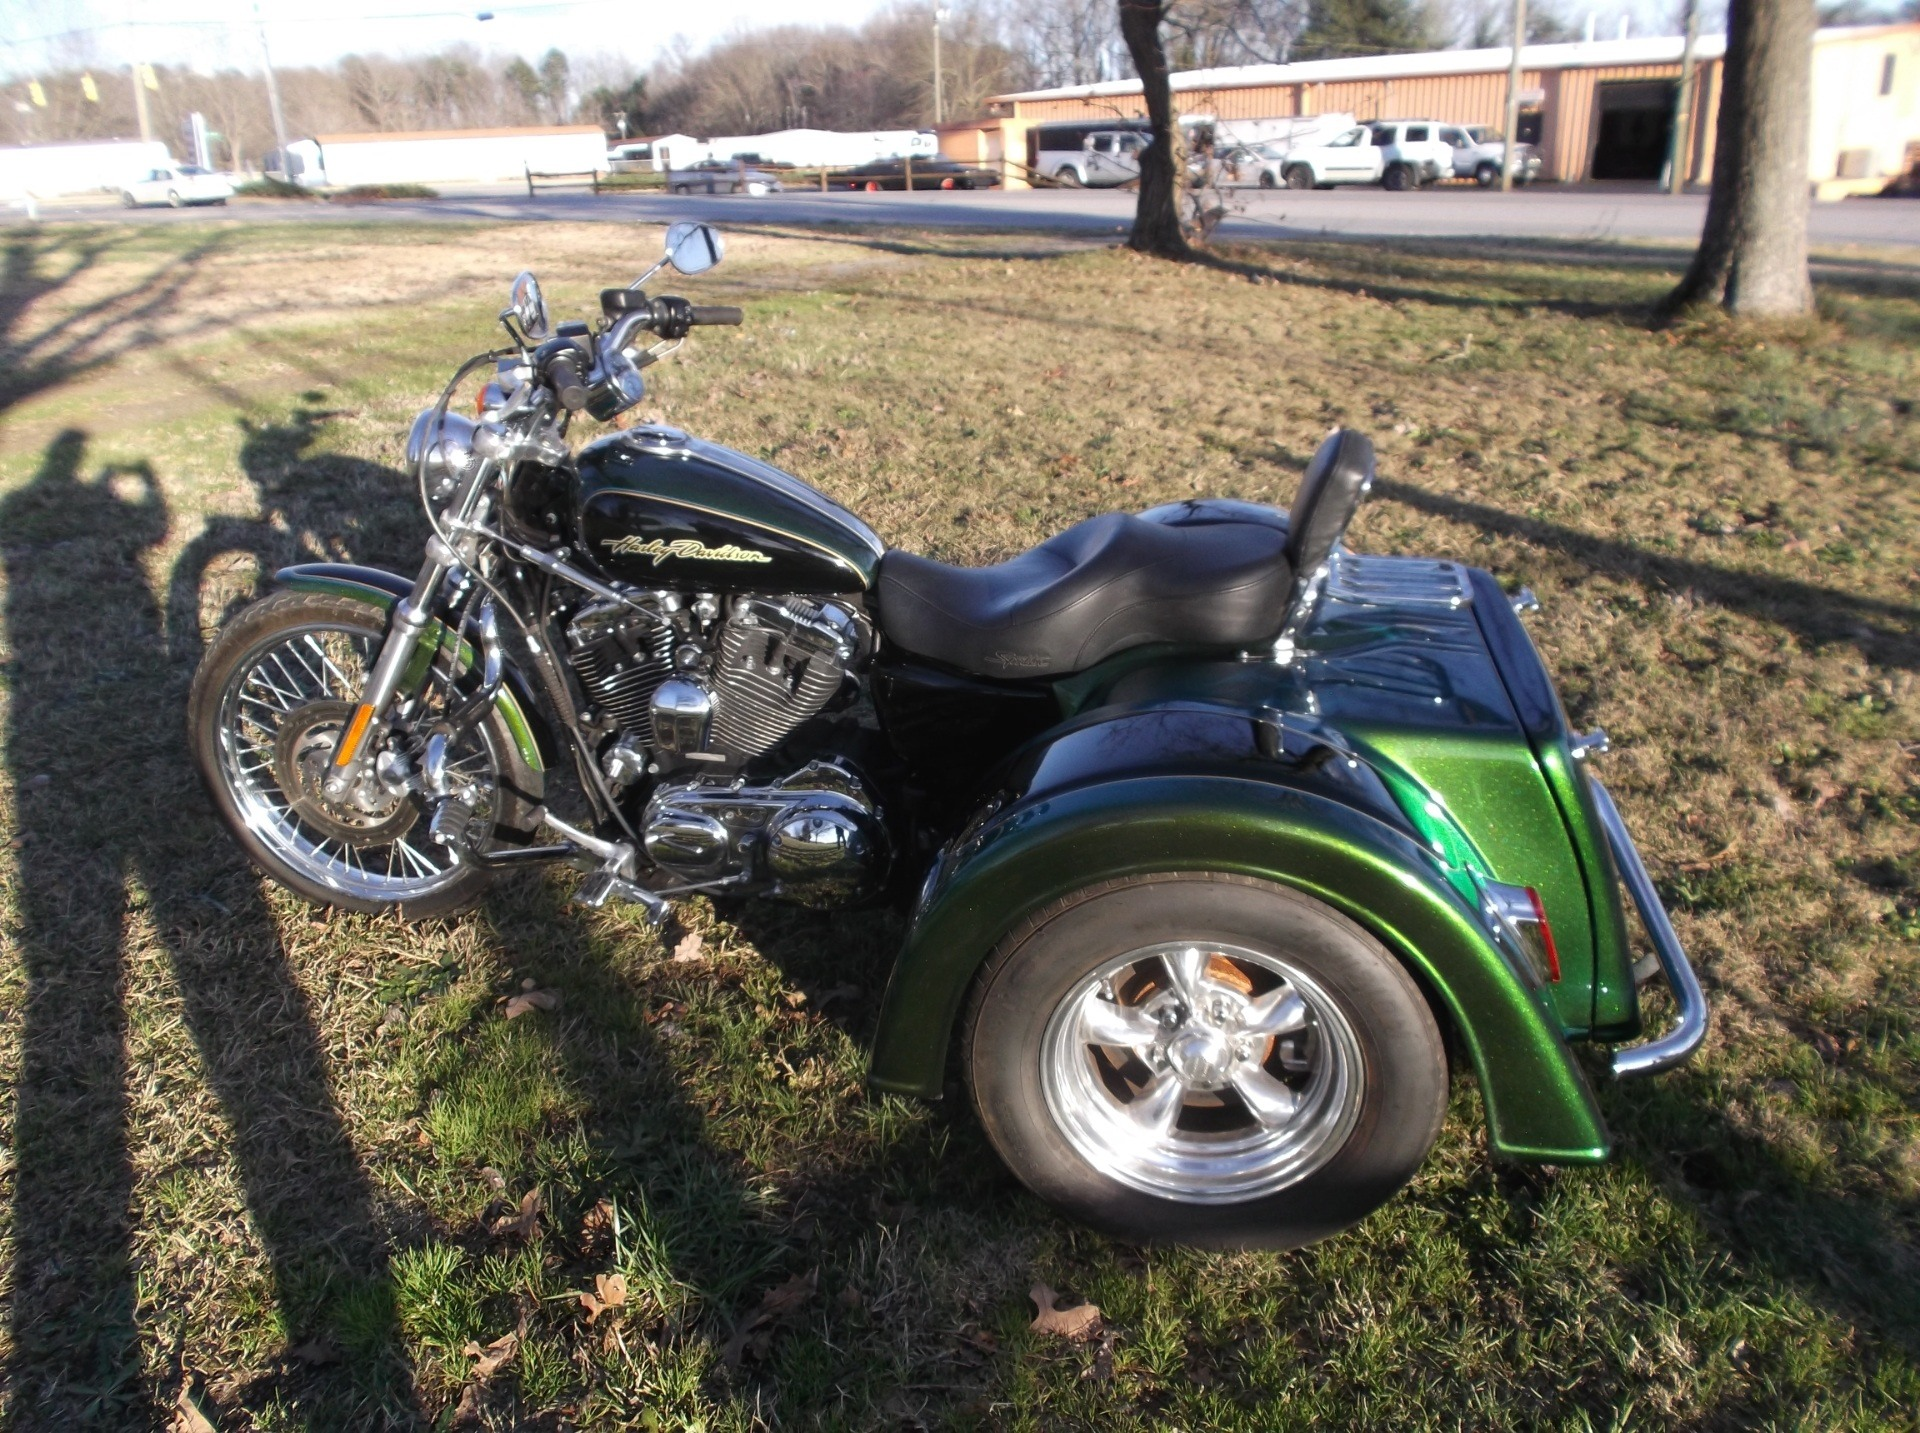 2006 Harley-Davidson XL1200 MOTORTRIKE 11